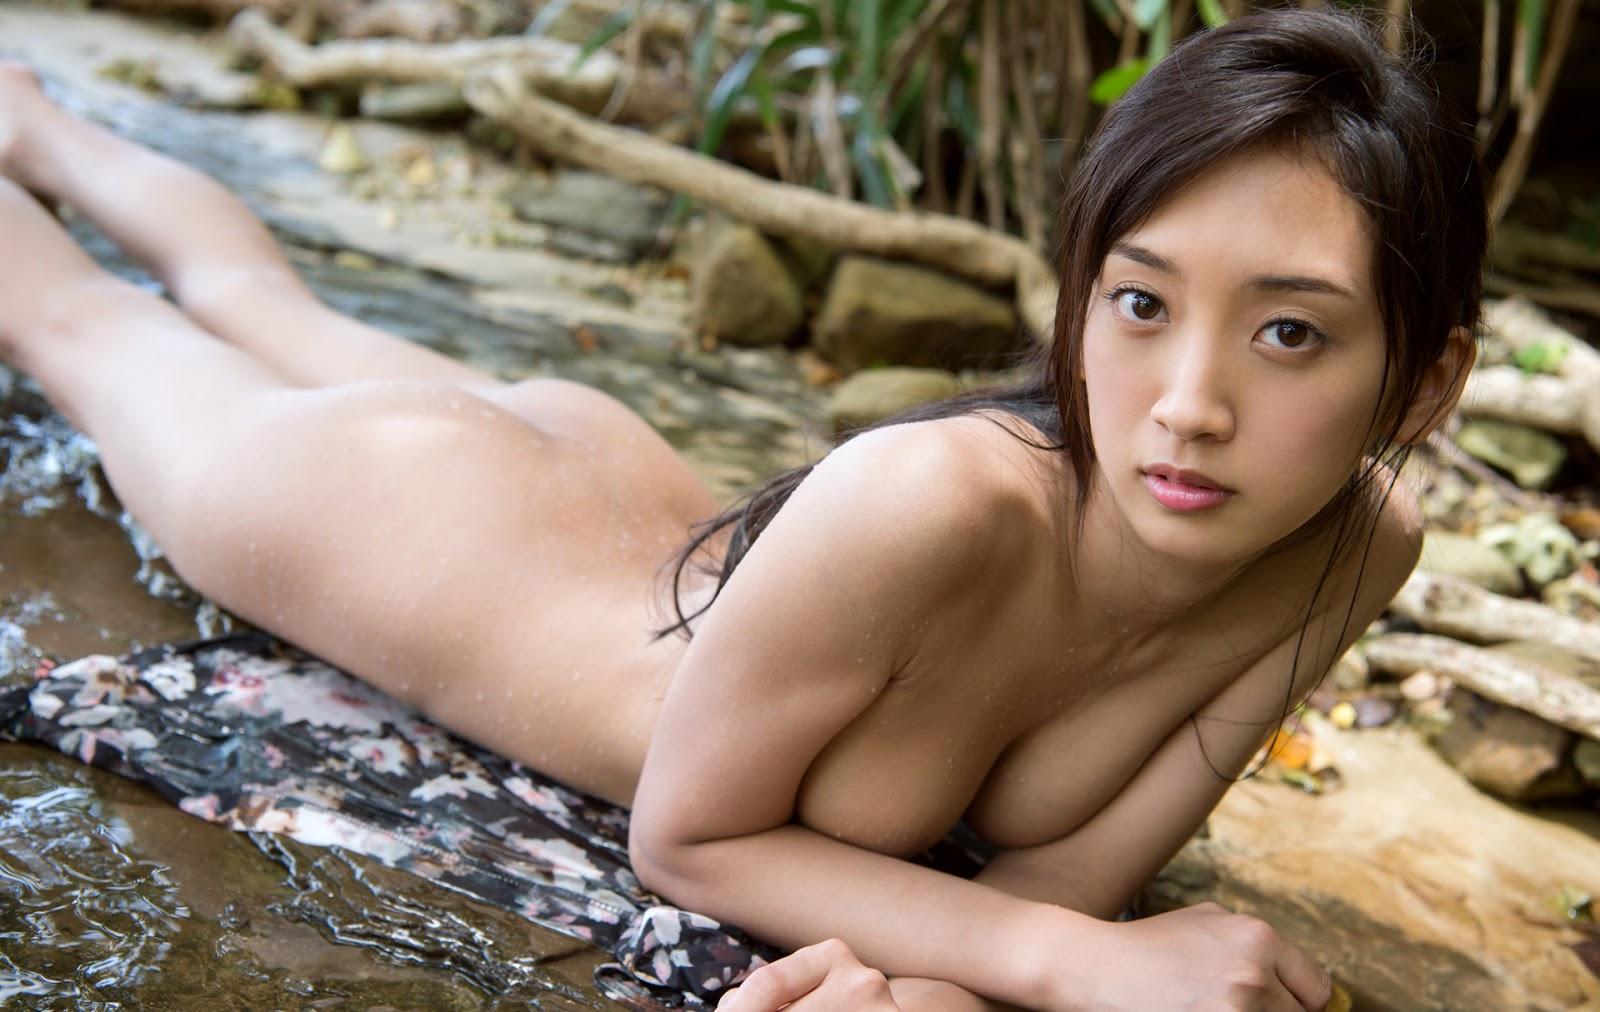 An Tsujimoto